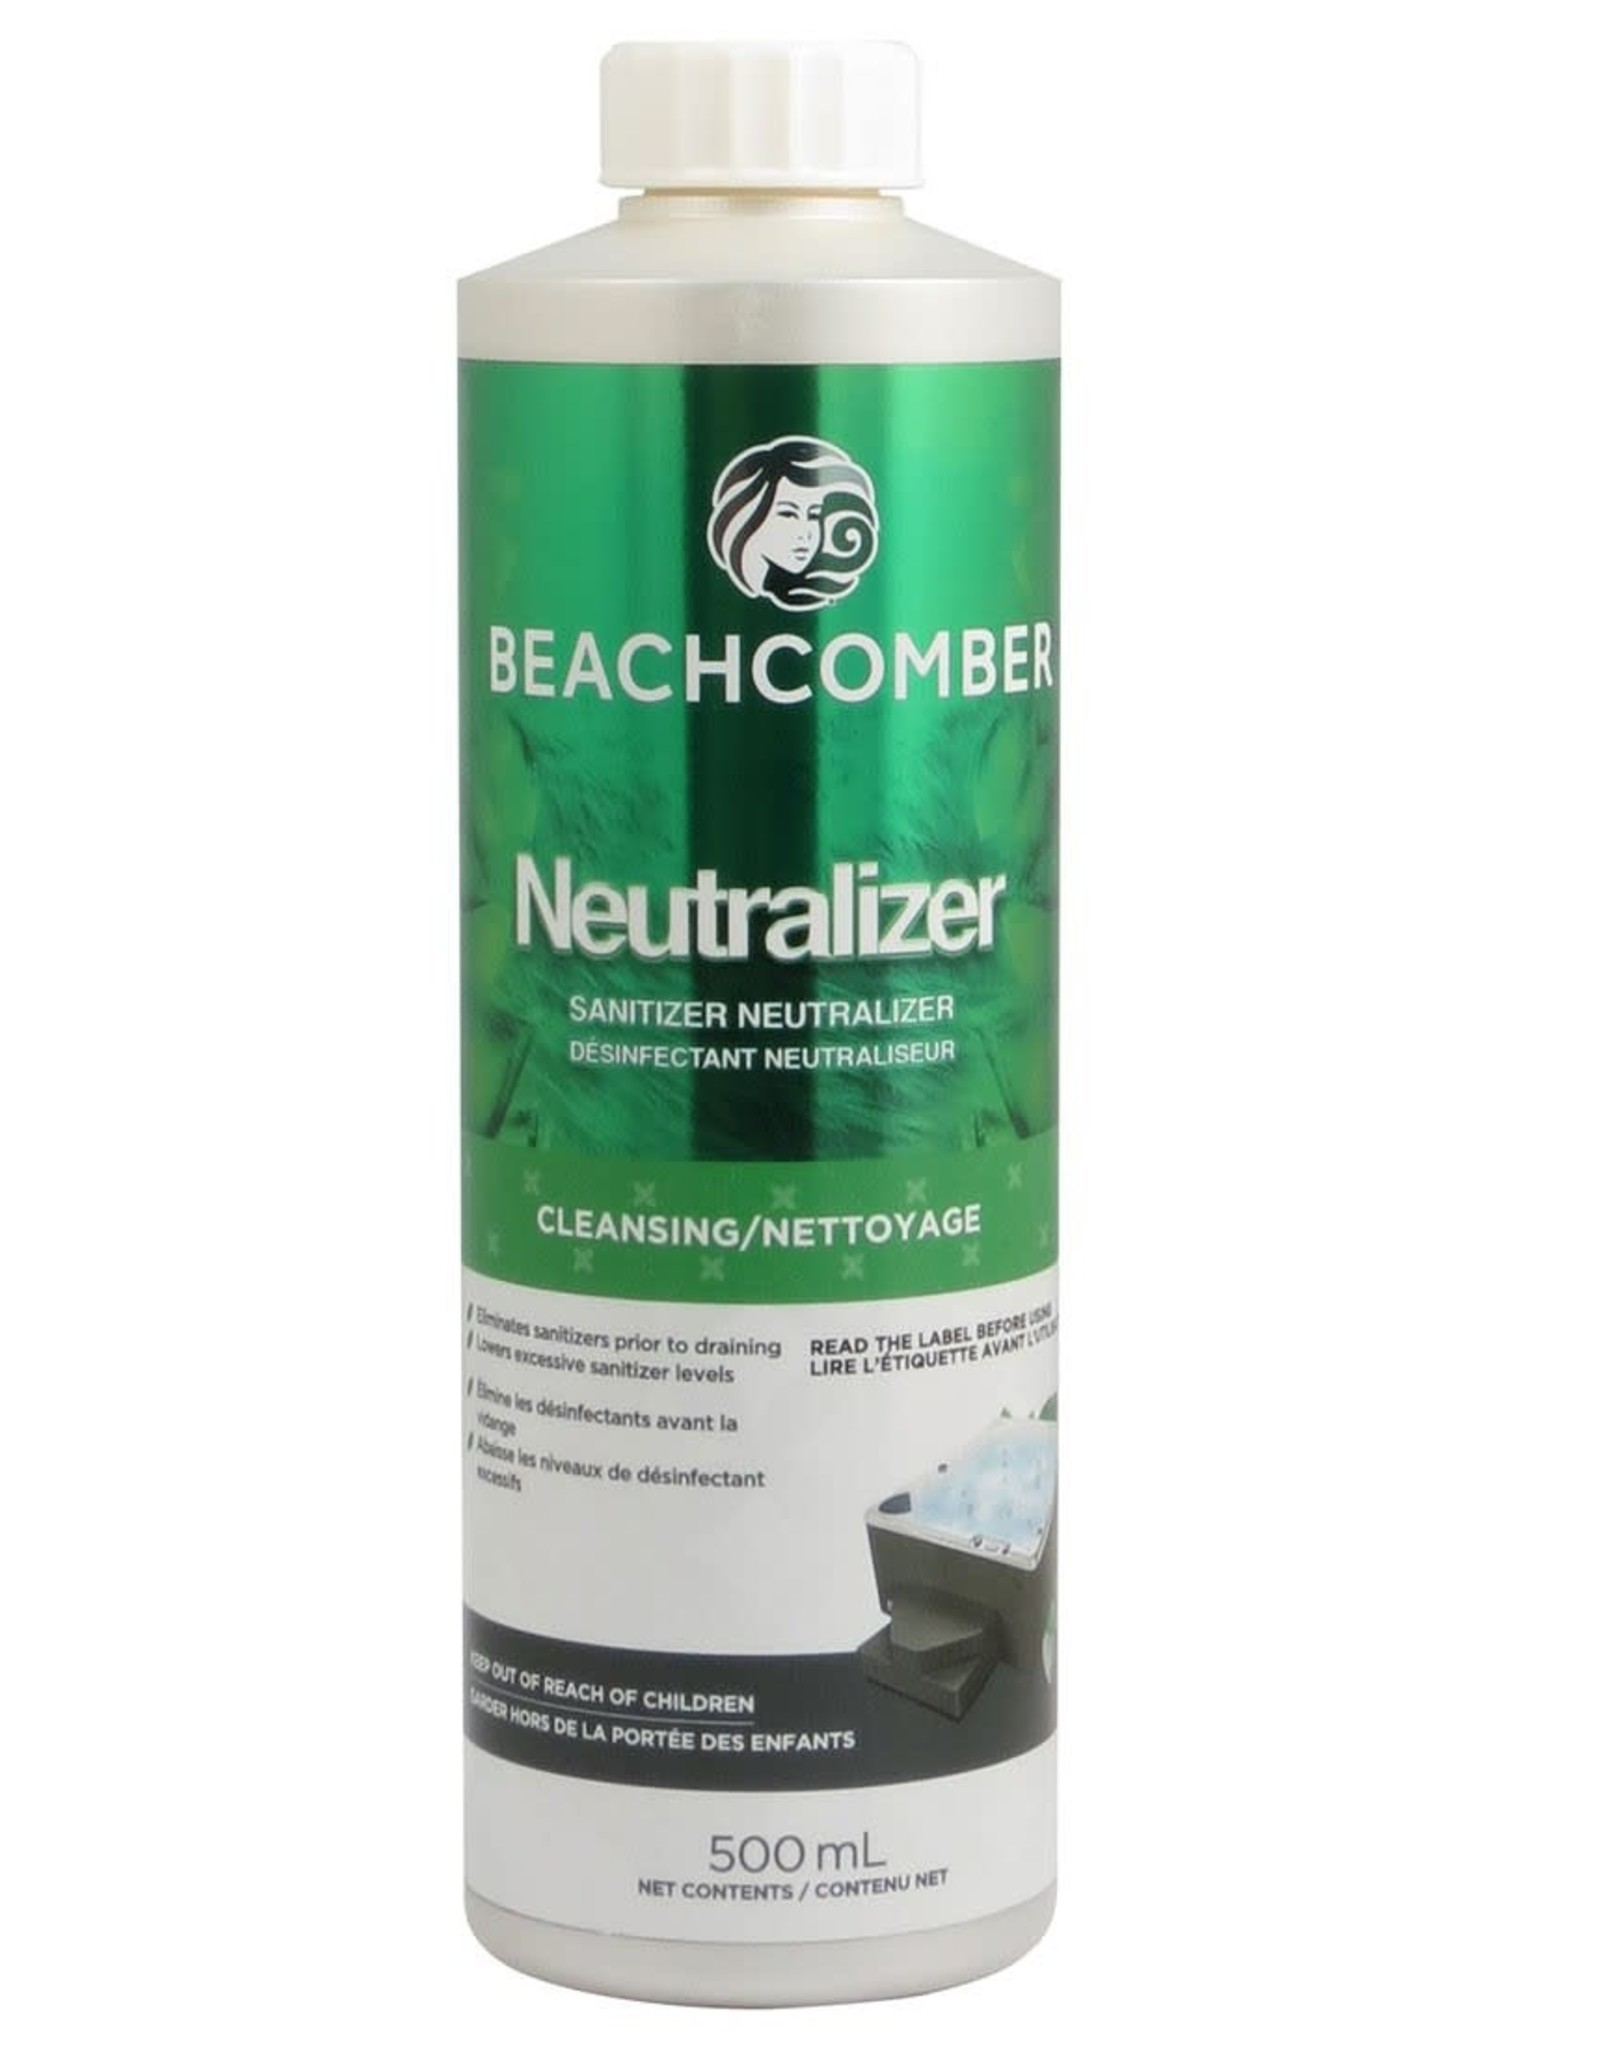 BEACHCOMBER BEACHCOMBER Neutralizer (500ml) - Sanitizer Eliminator